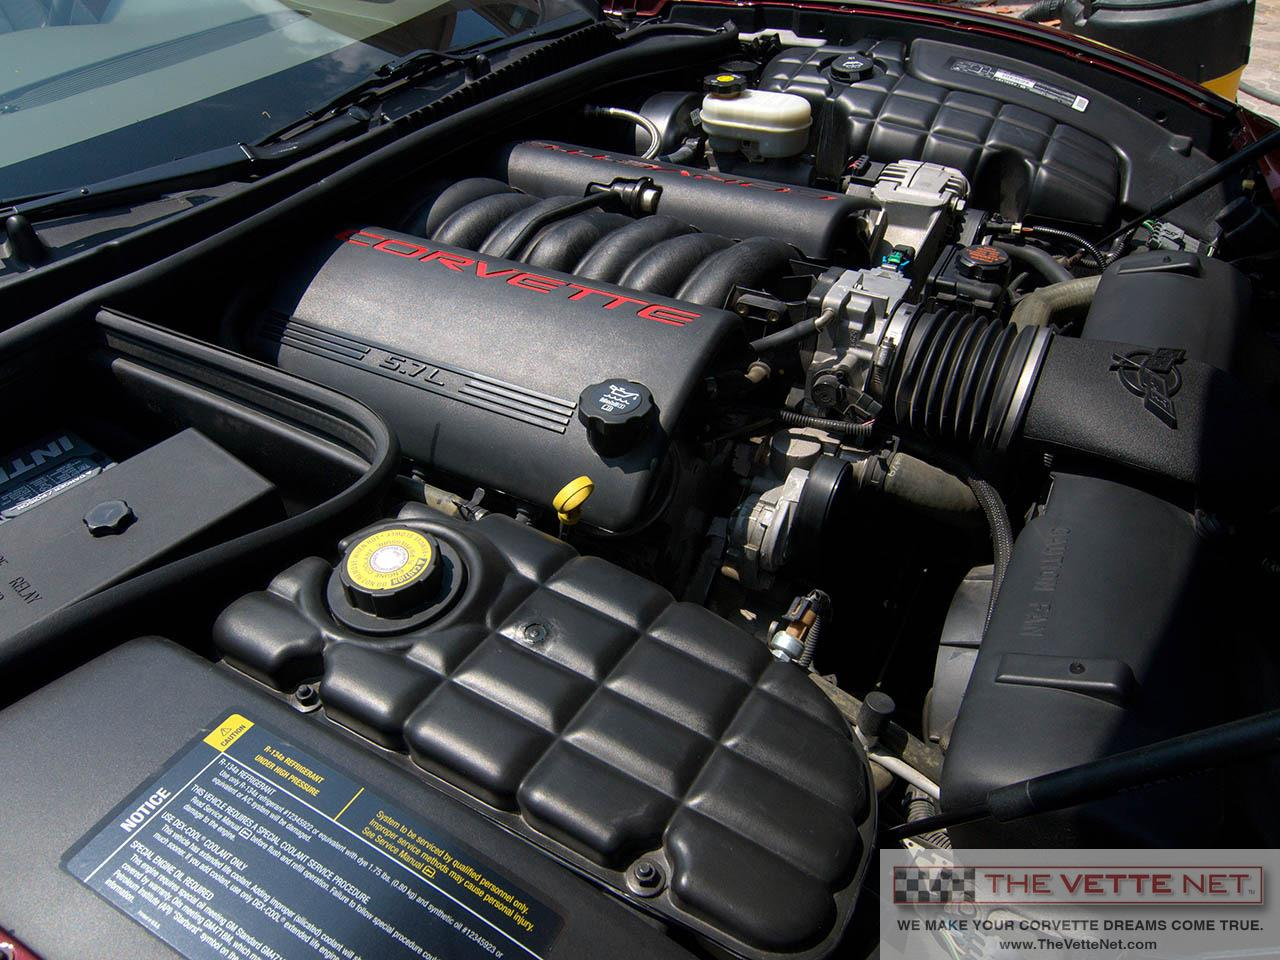 Large Picture of '03 Corvette located in Sarasota Florida - $31,990.00 - I62B